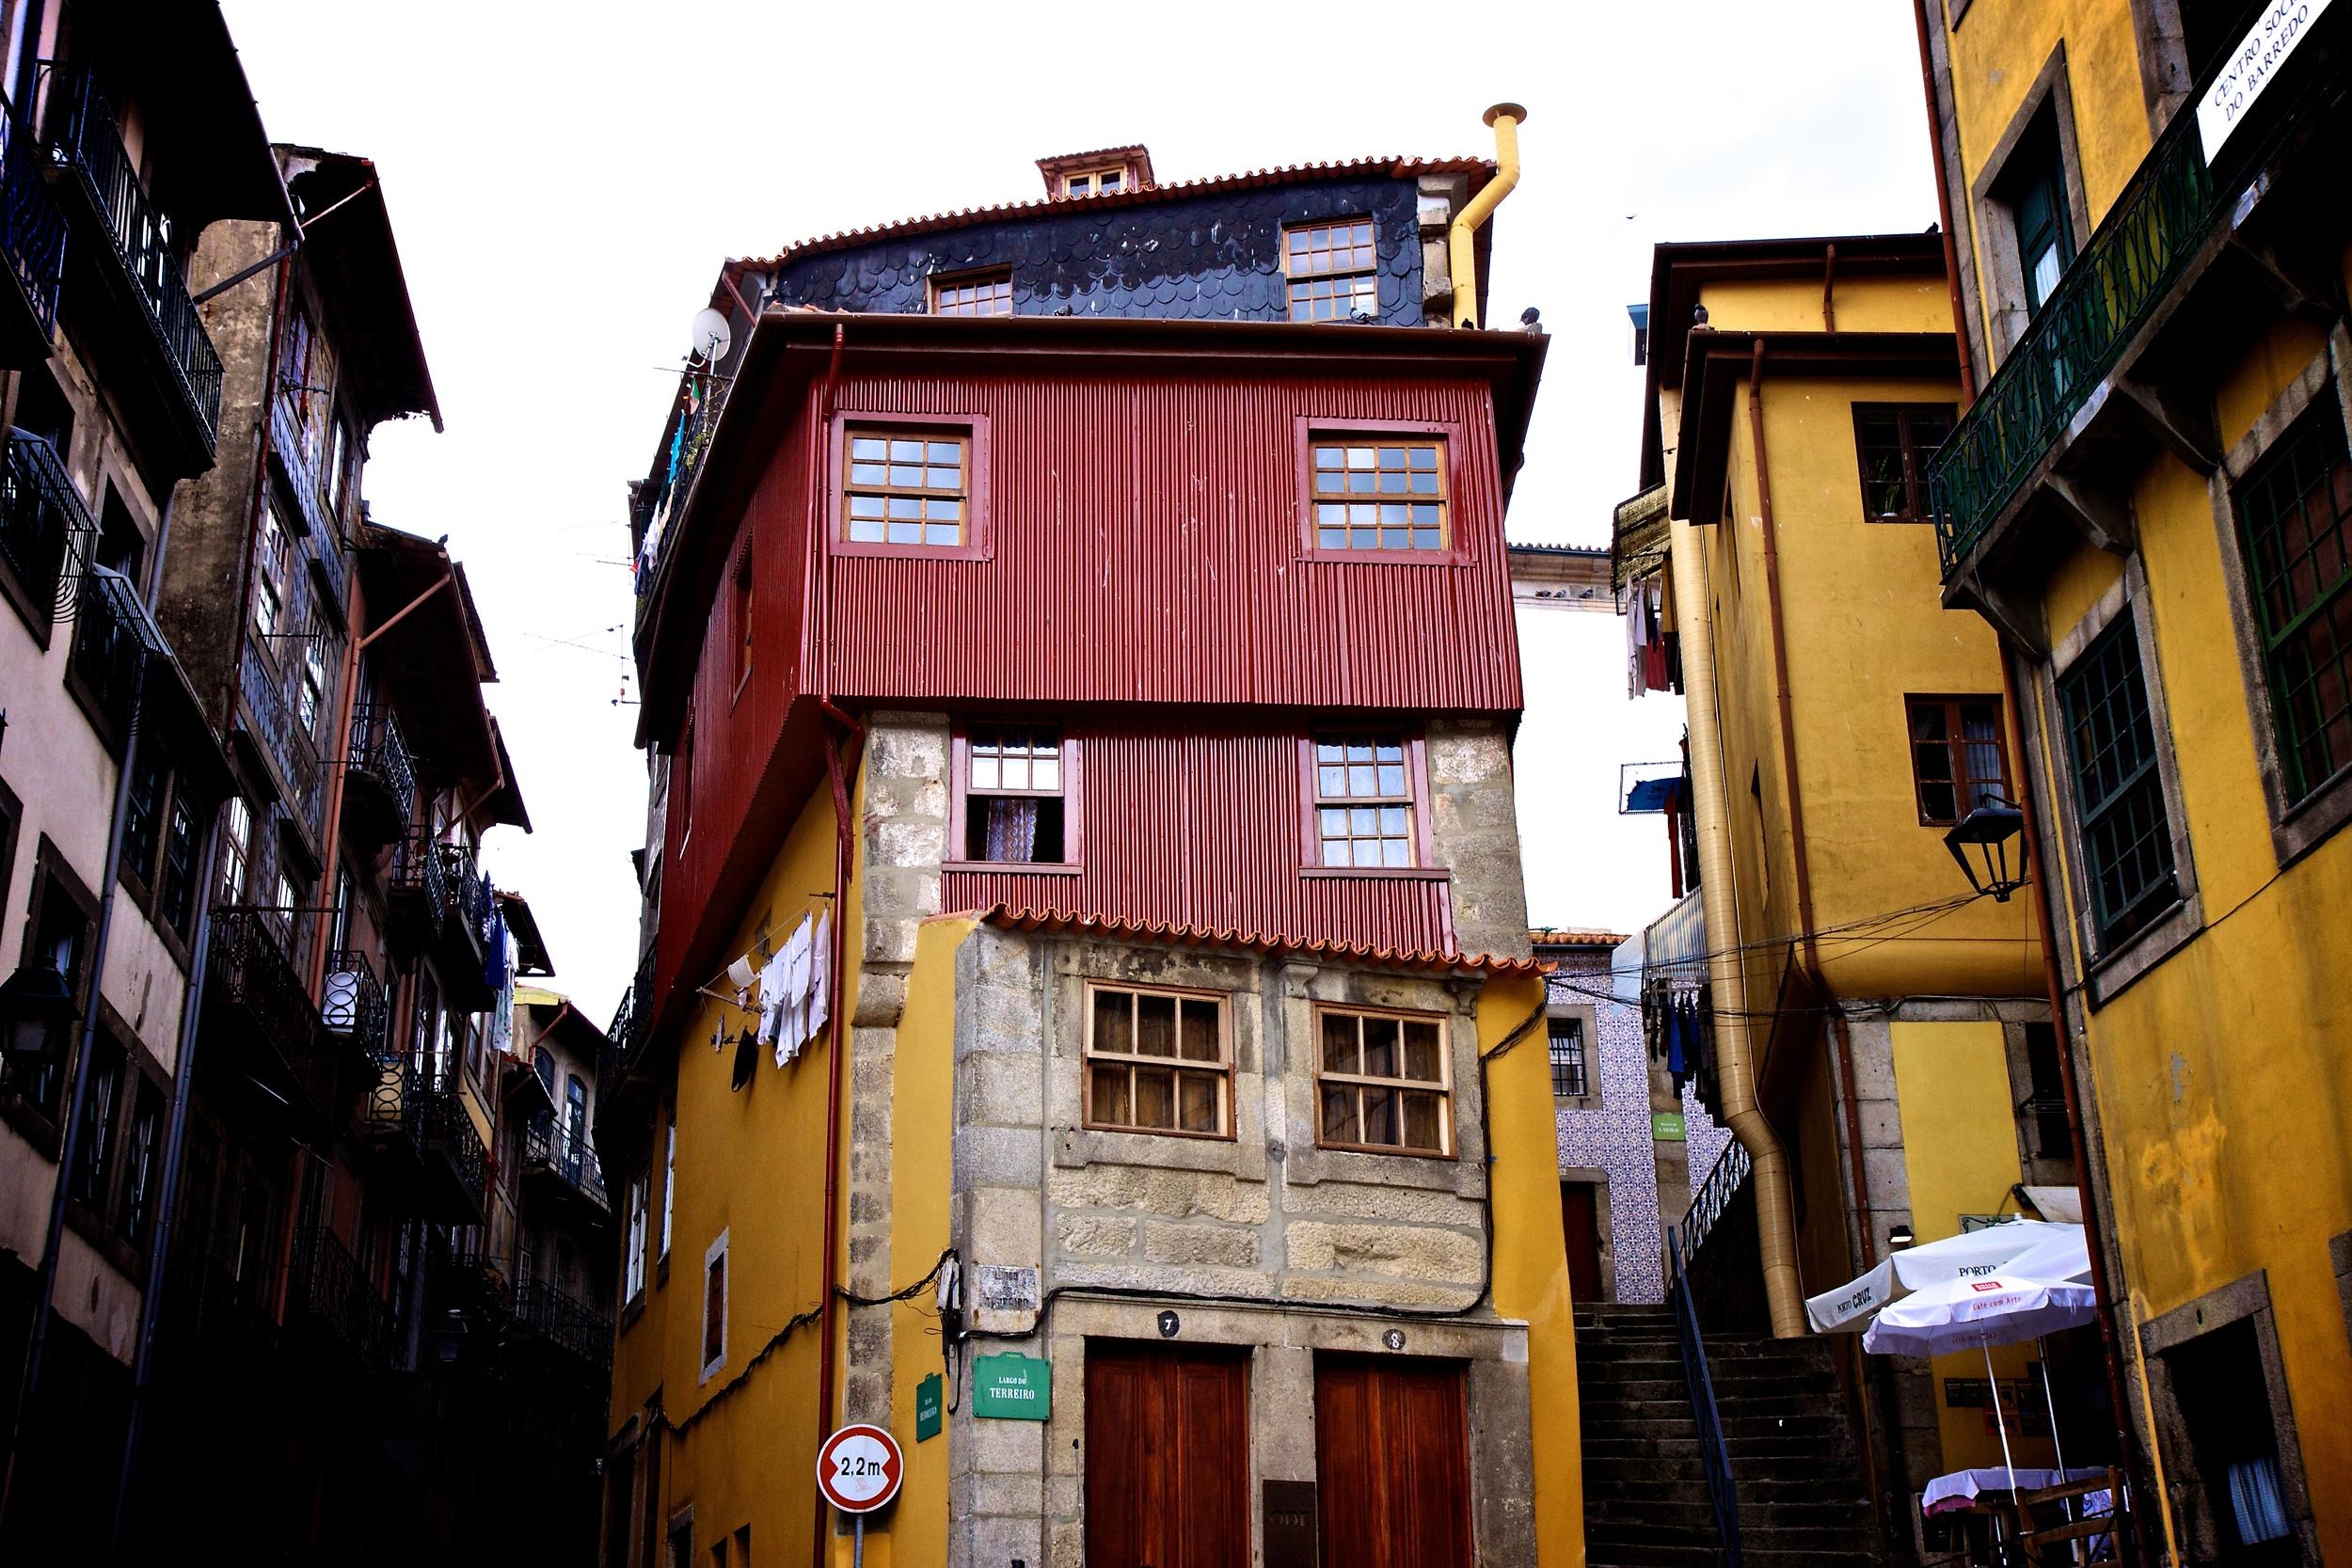 porto-juillet-2011-81.jpg